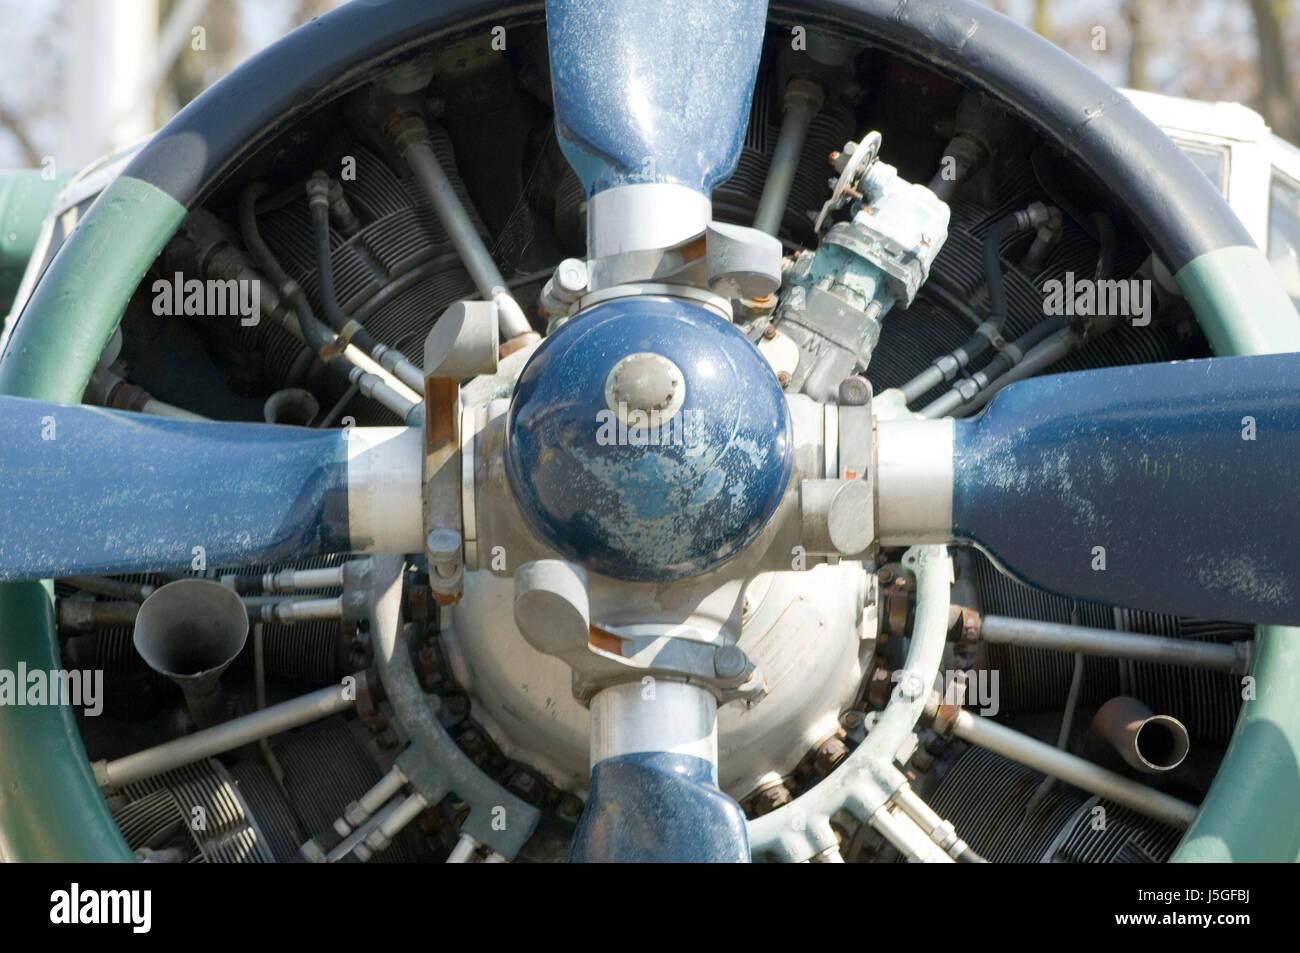 Großzügig Sternmotor Anschlussdiagramm Fotos - Verdrahtungsideen ...